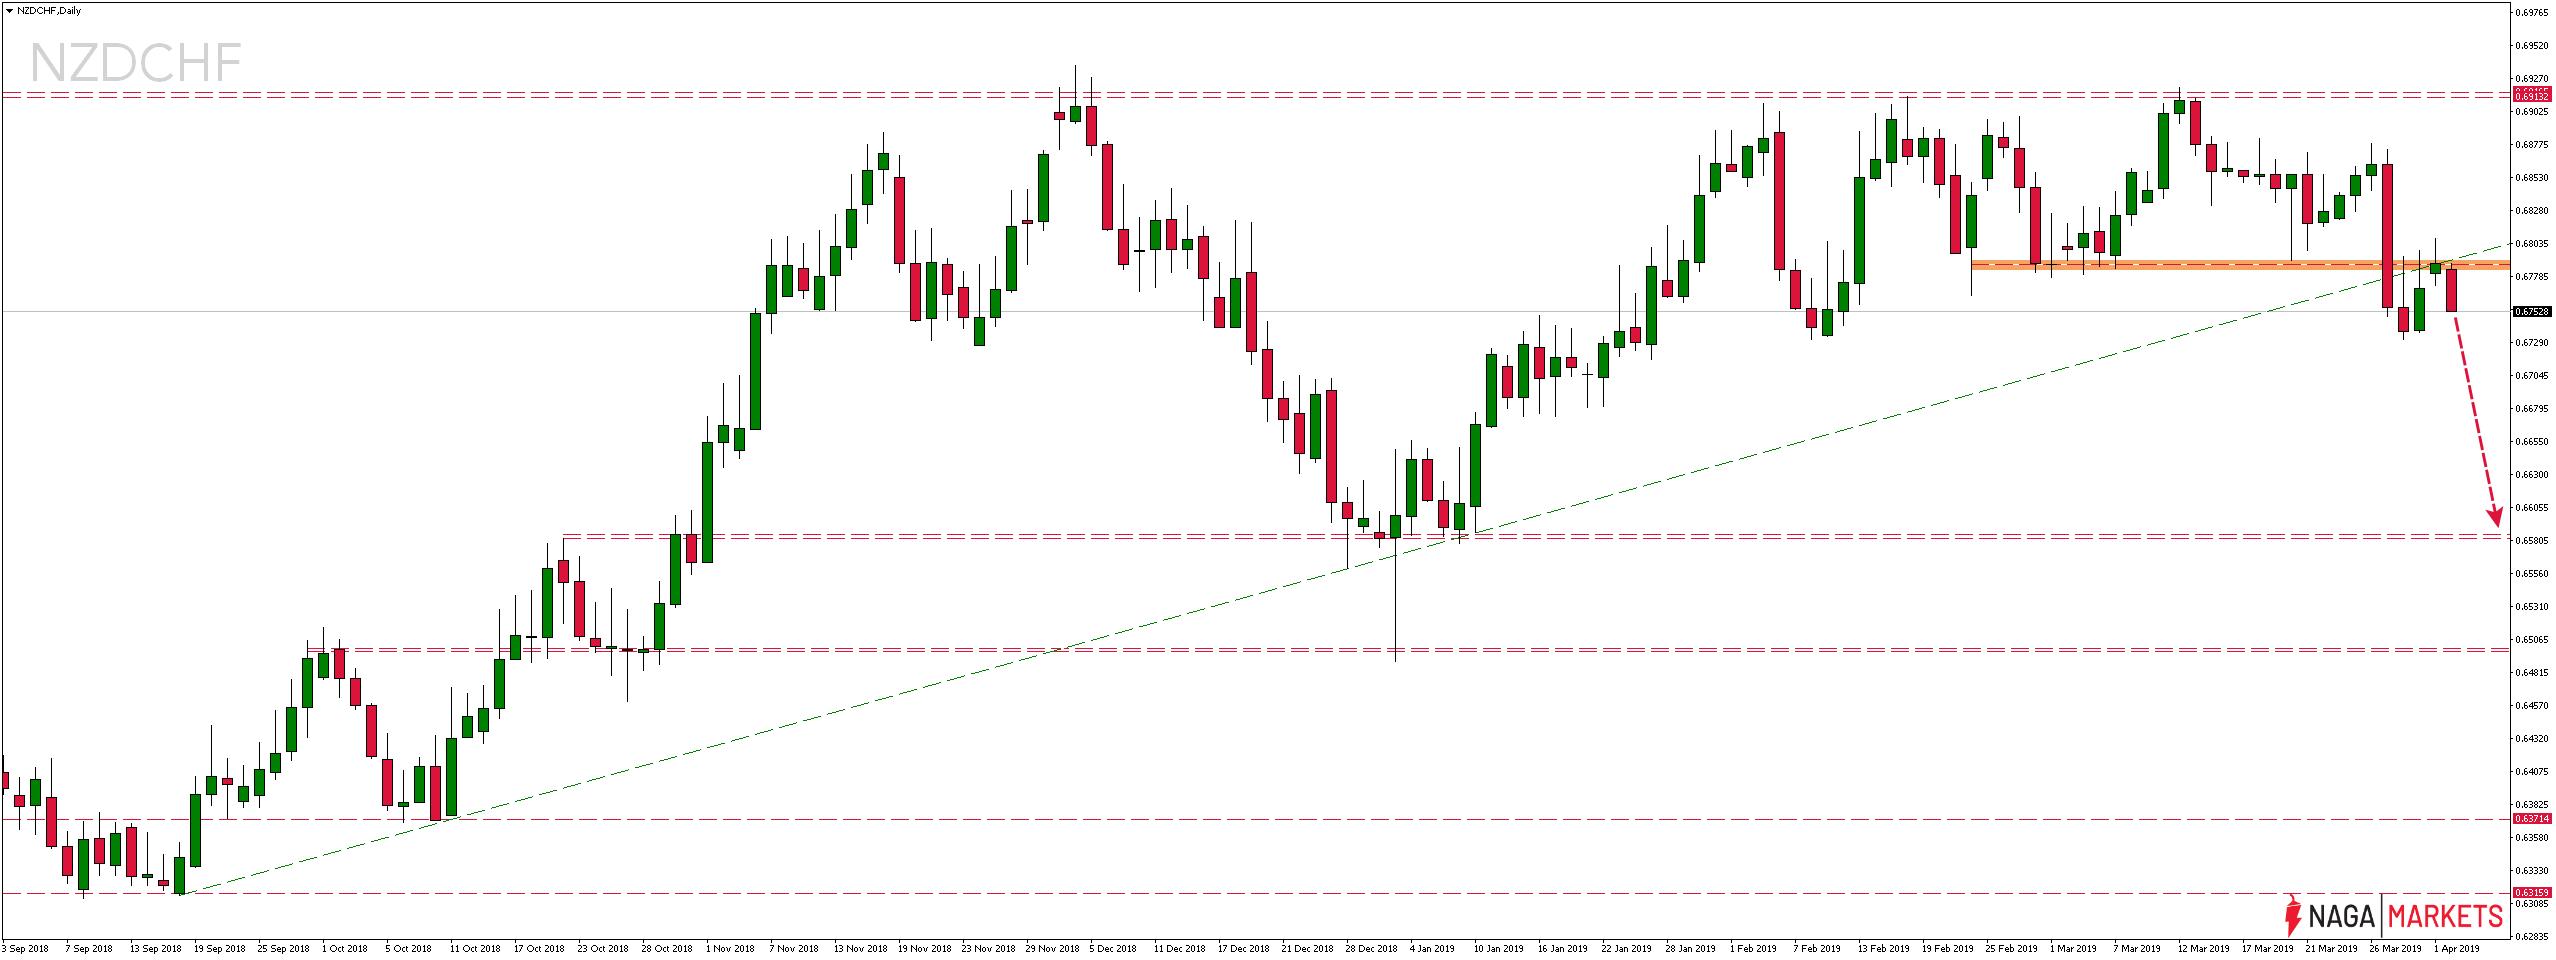 Kurs pary walutowej NZDCHF